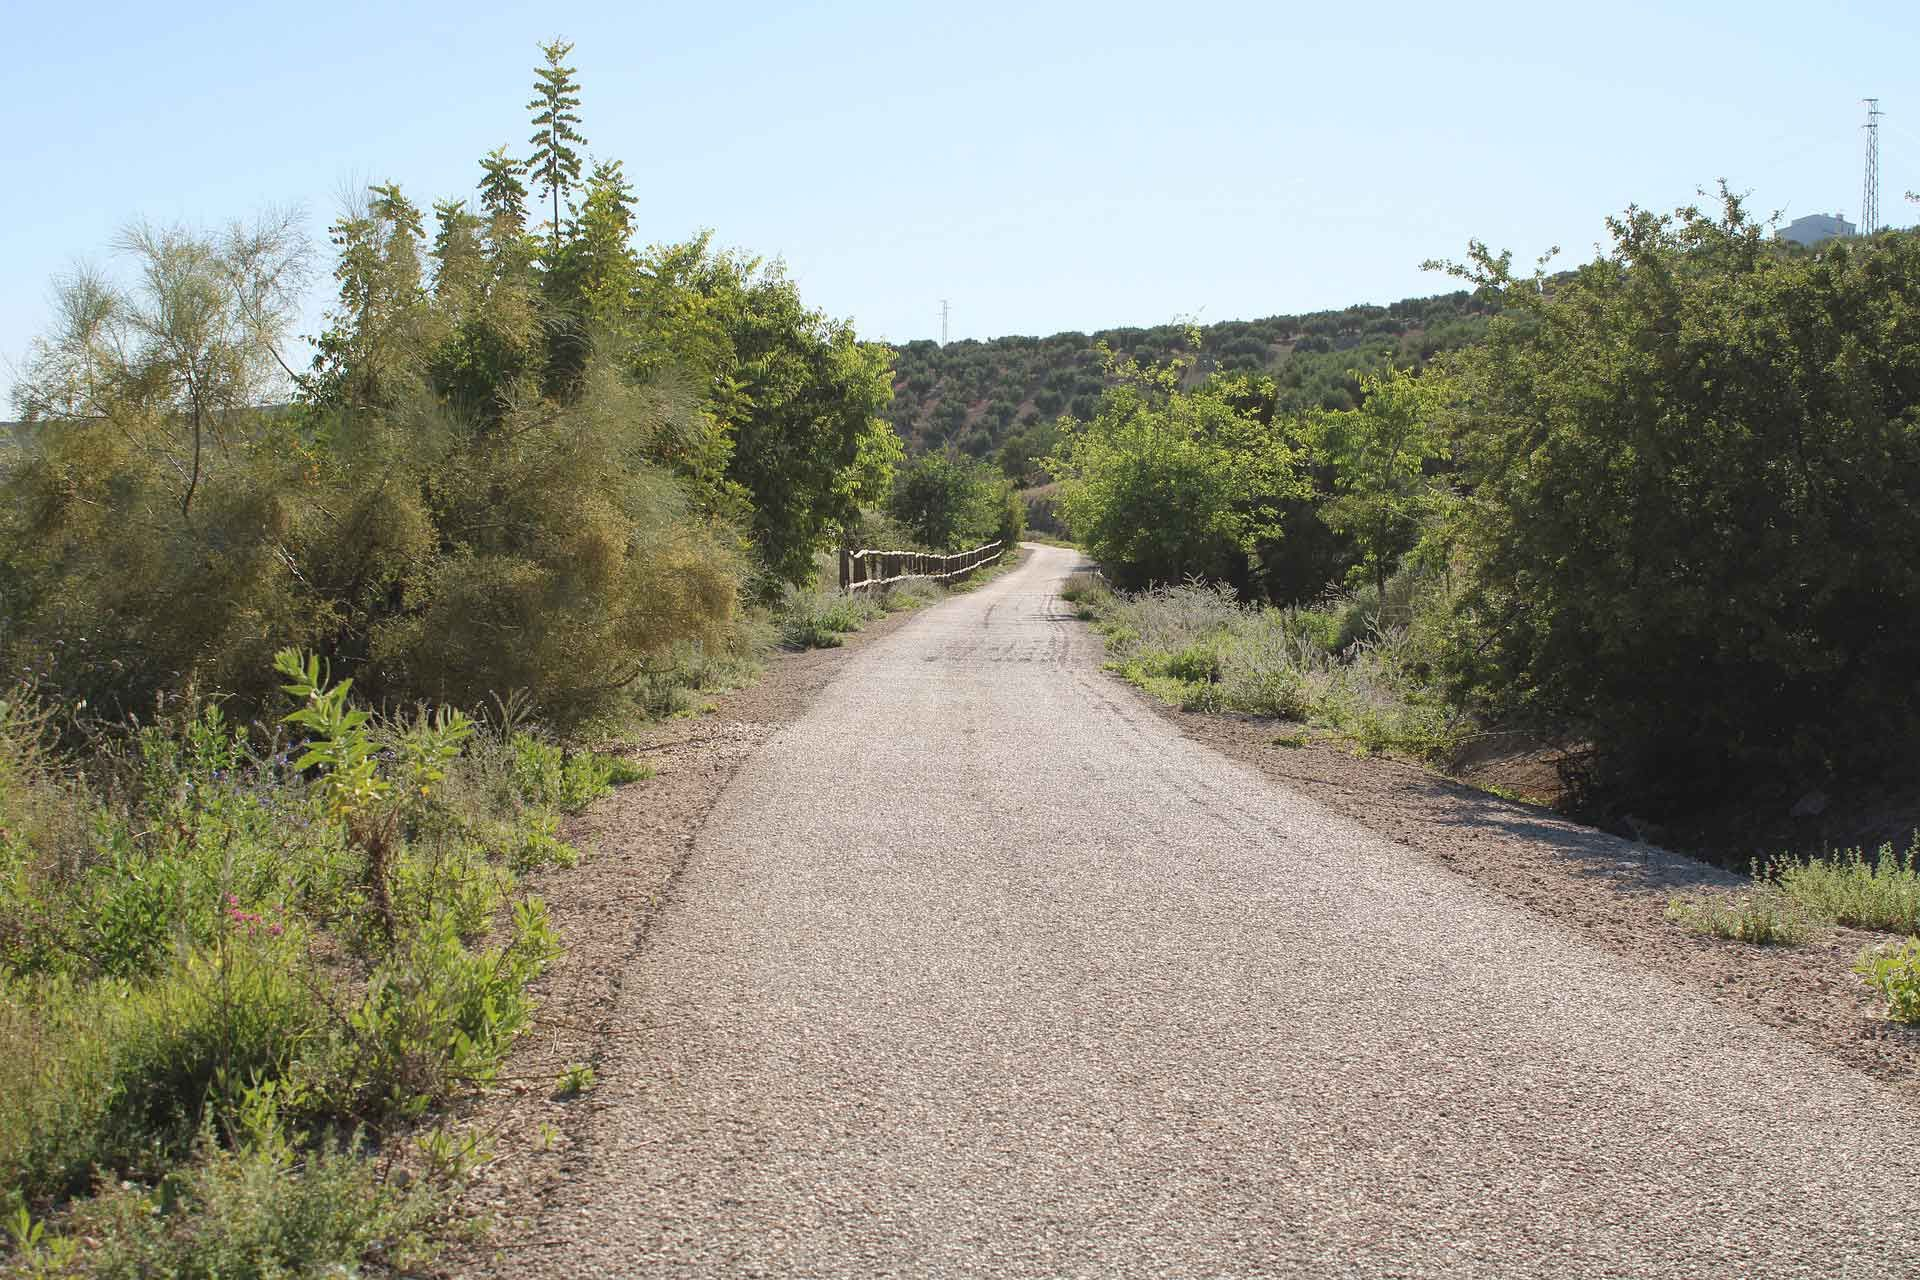 paisajes a lo largo de la ruta en direccion a la vecina localida de Torredonjimeno